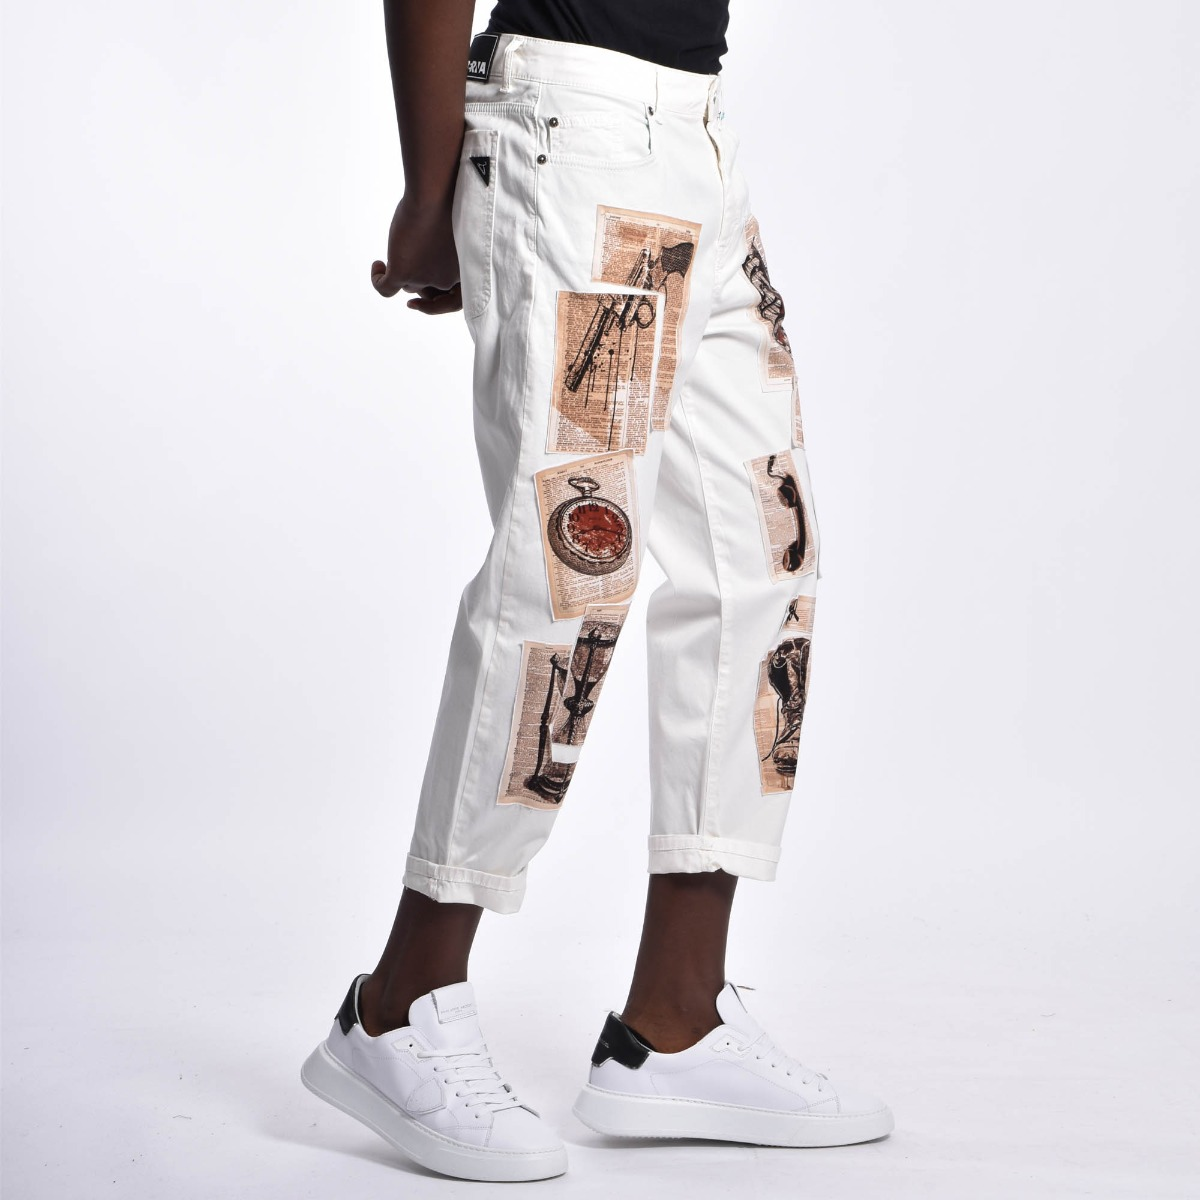 Pantalone toppe giornale - Bianco